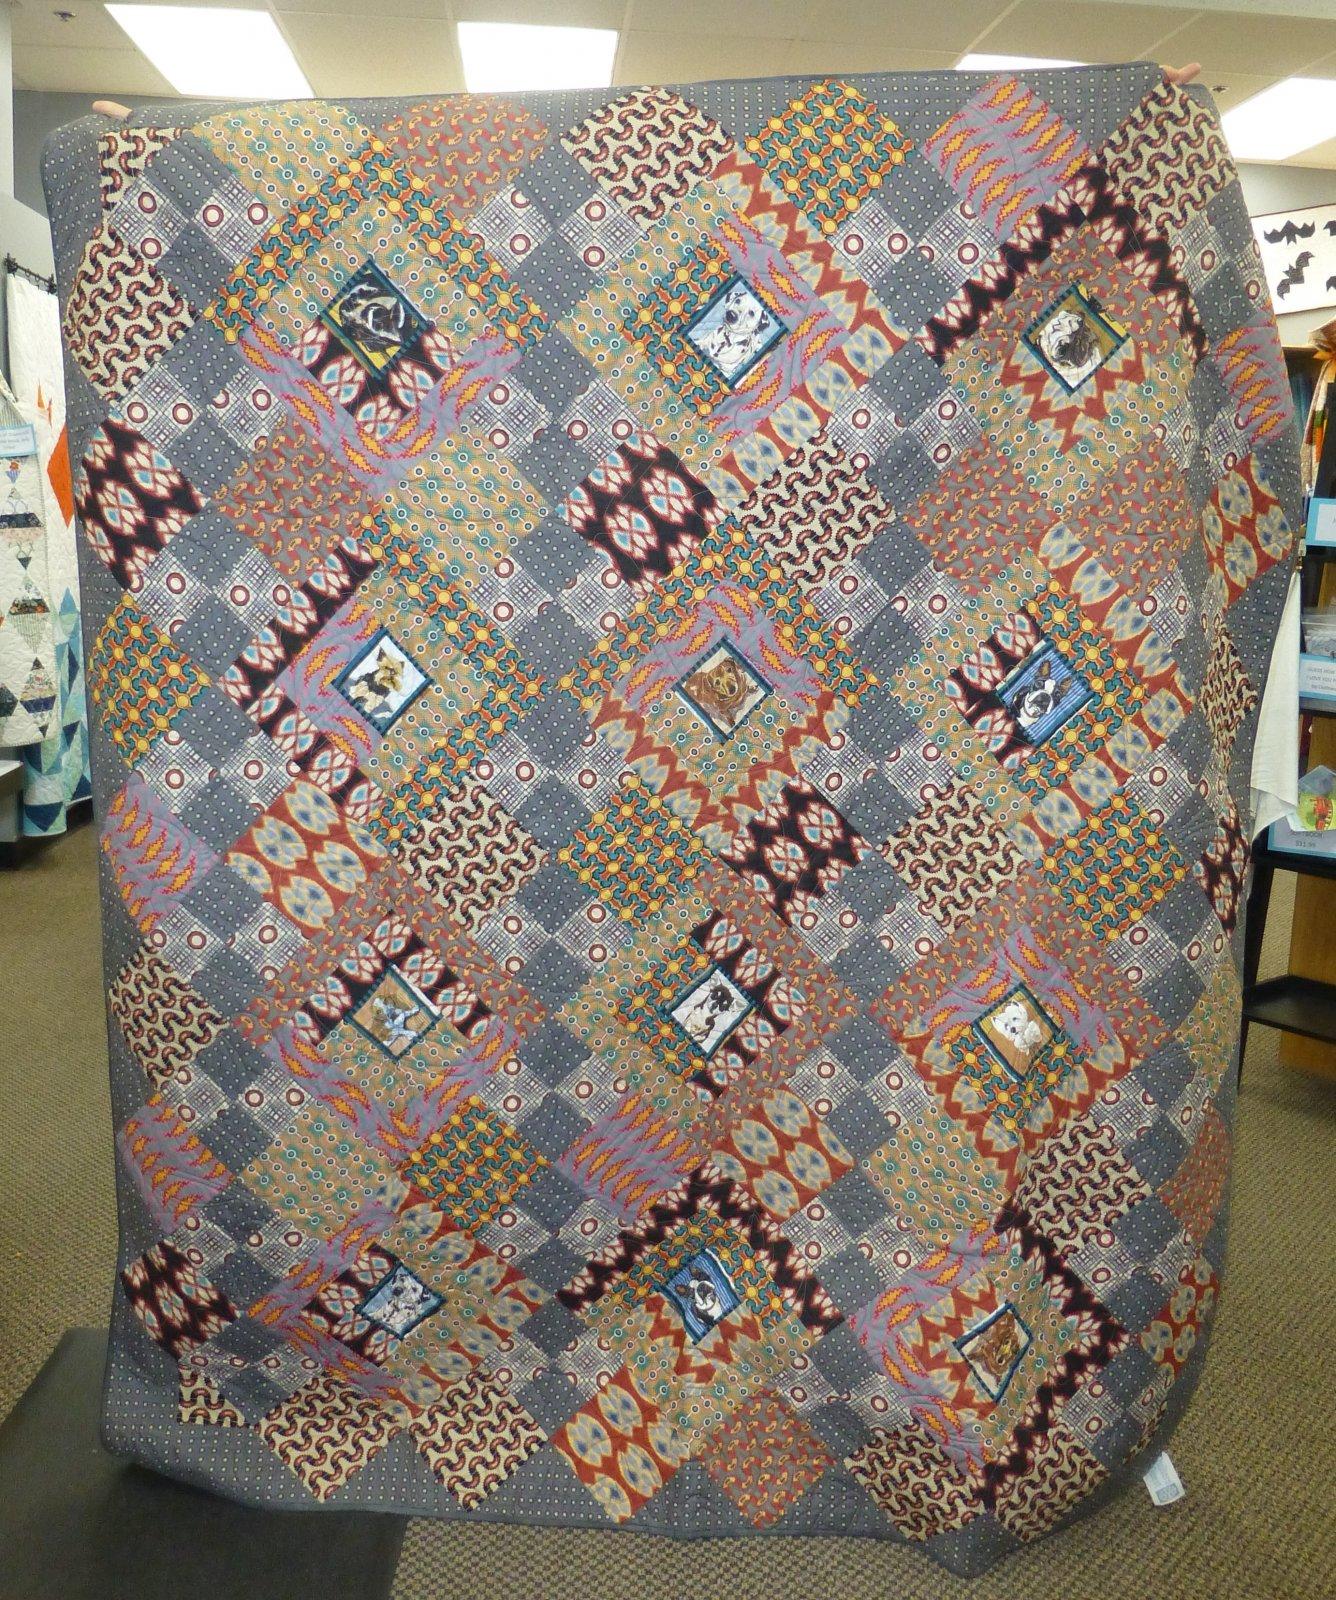 Dog Lover Quilt 64 x 73